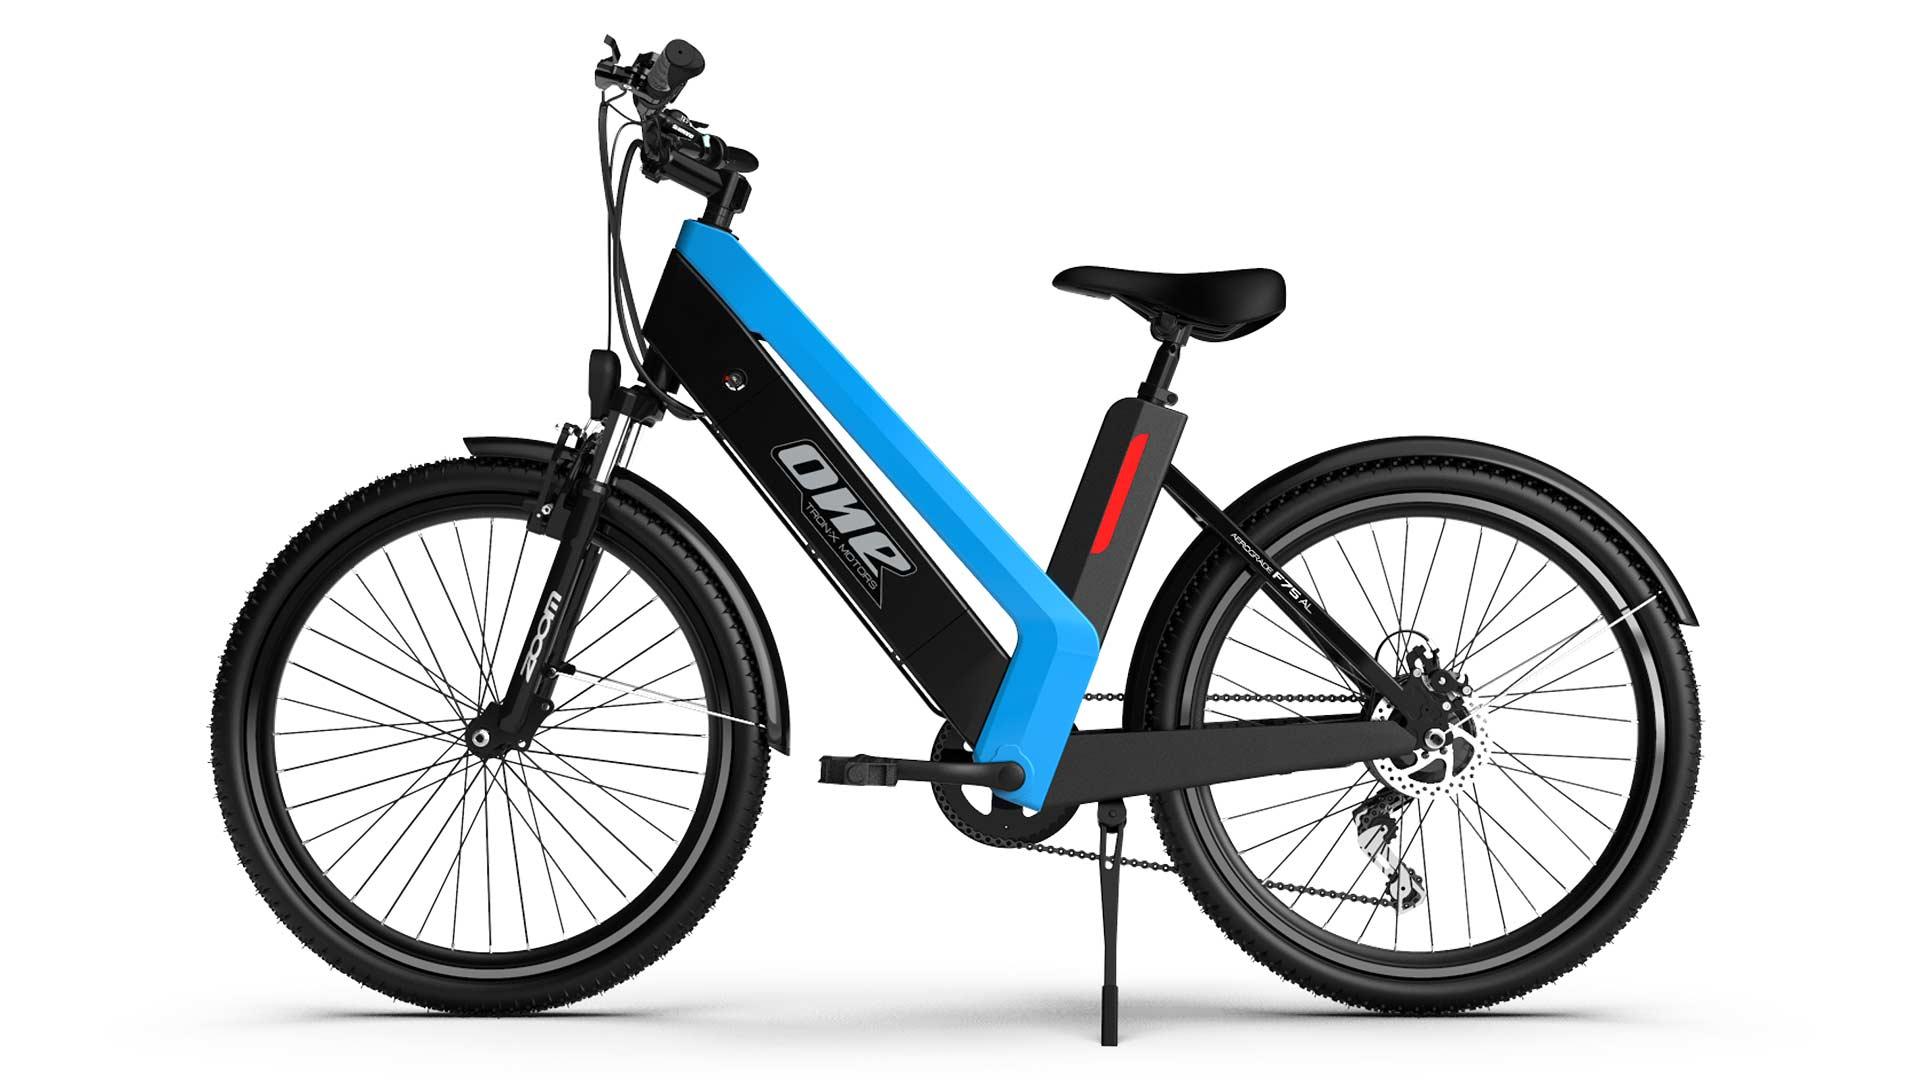 Tronx-One-Electric-Bike